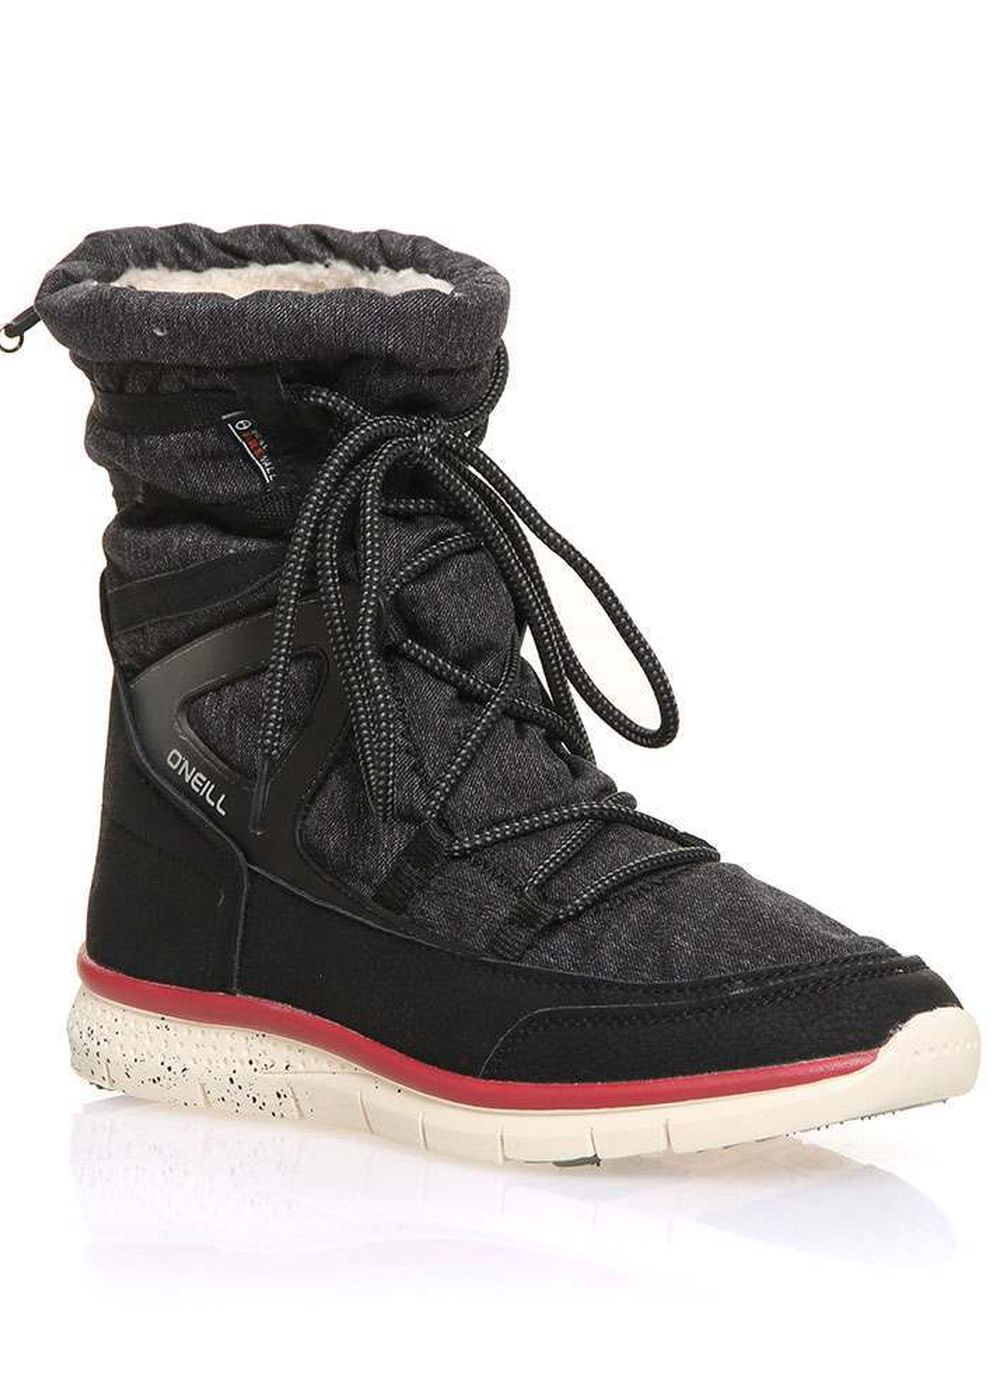 oneill-zephyr-lt-snowboots-black